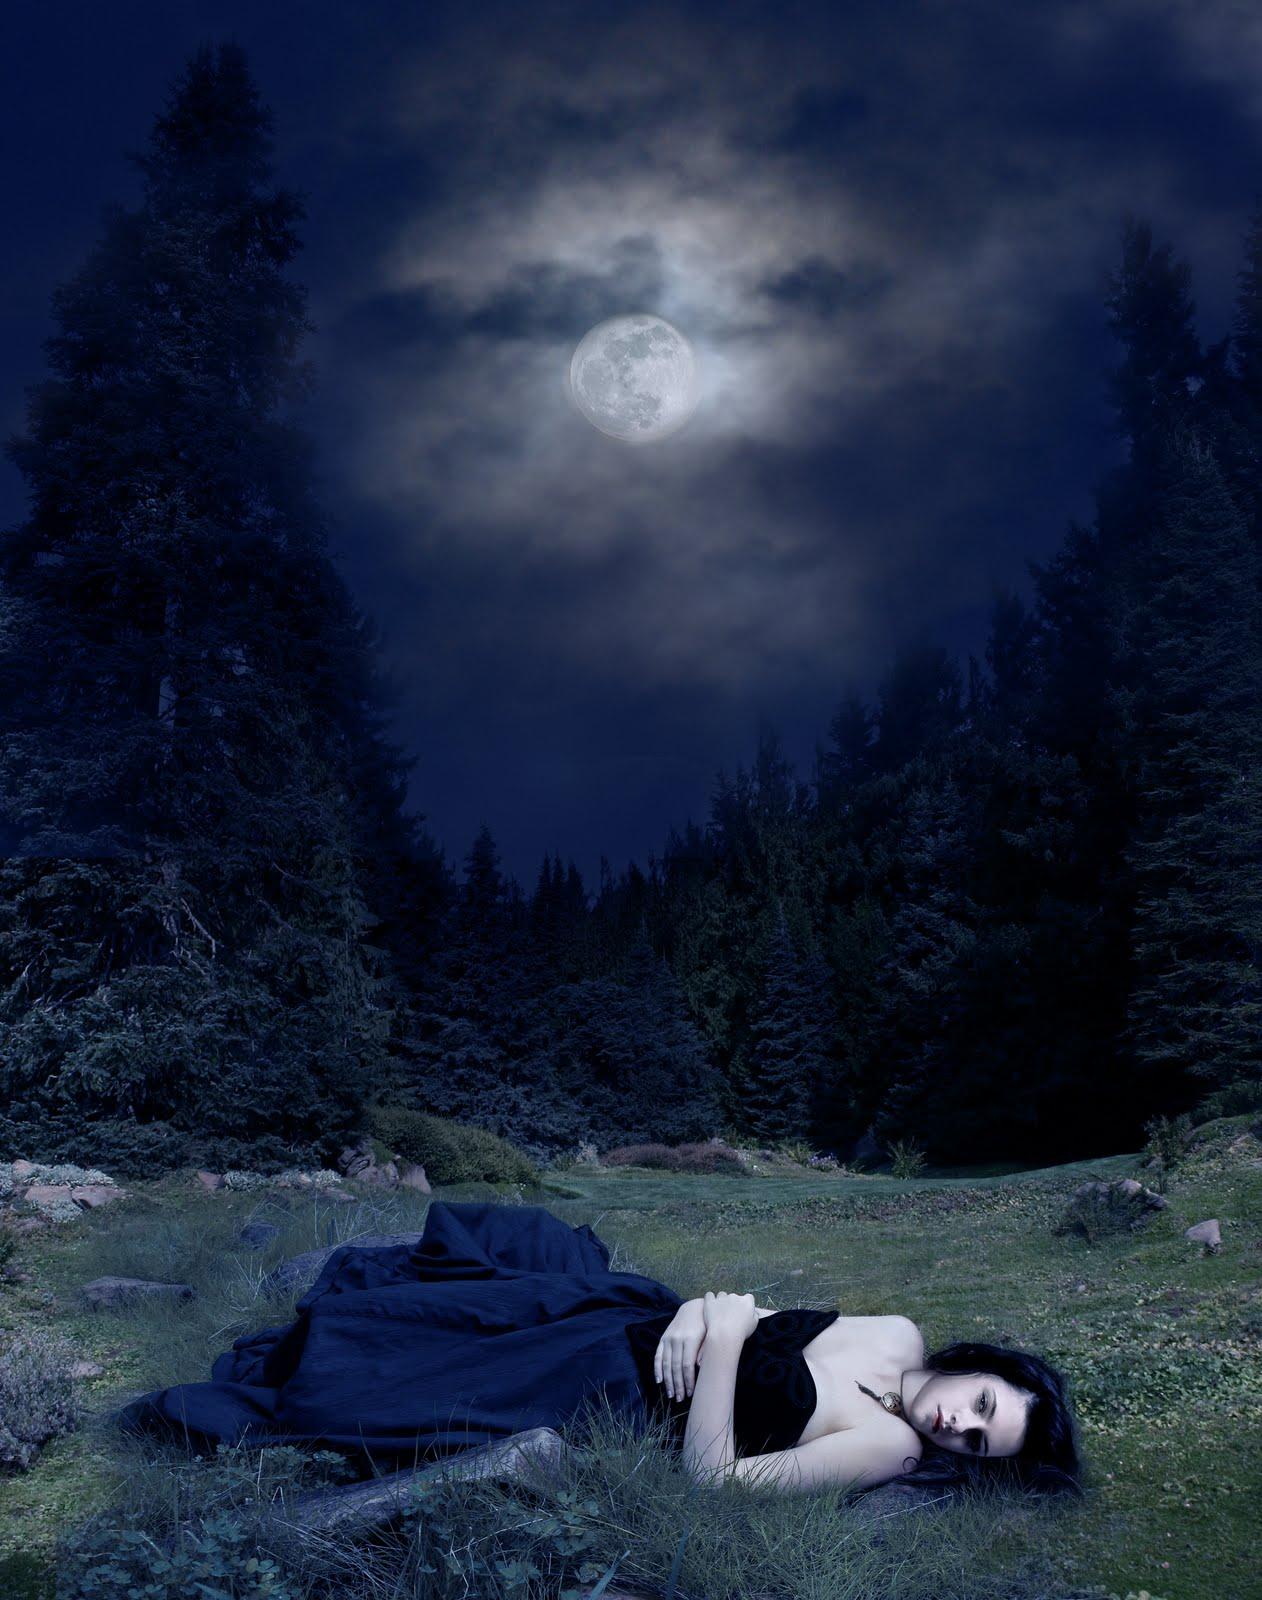 http://2.bp.blogspot.com/_NoaIBawRd-4/SwRKzETvKrI/AAAAAAAAM4M/awVFERdgRiA/s1600/new-moon-new-moon-6062242-2020-2560.jpg